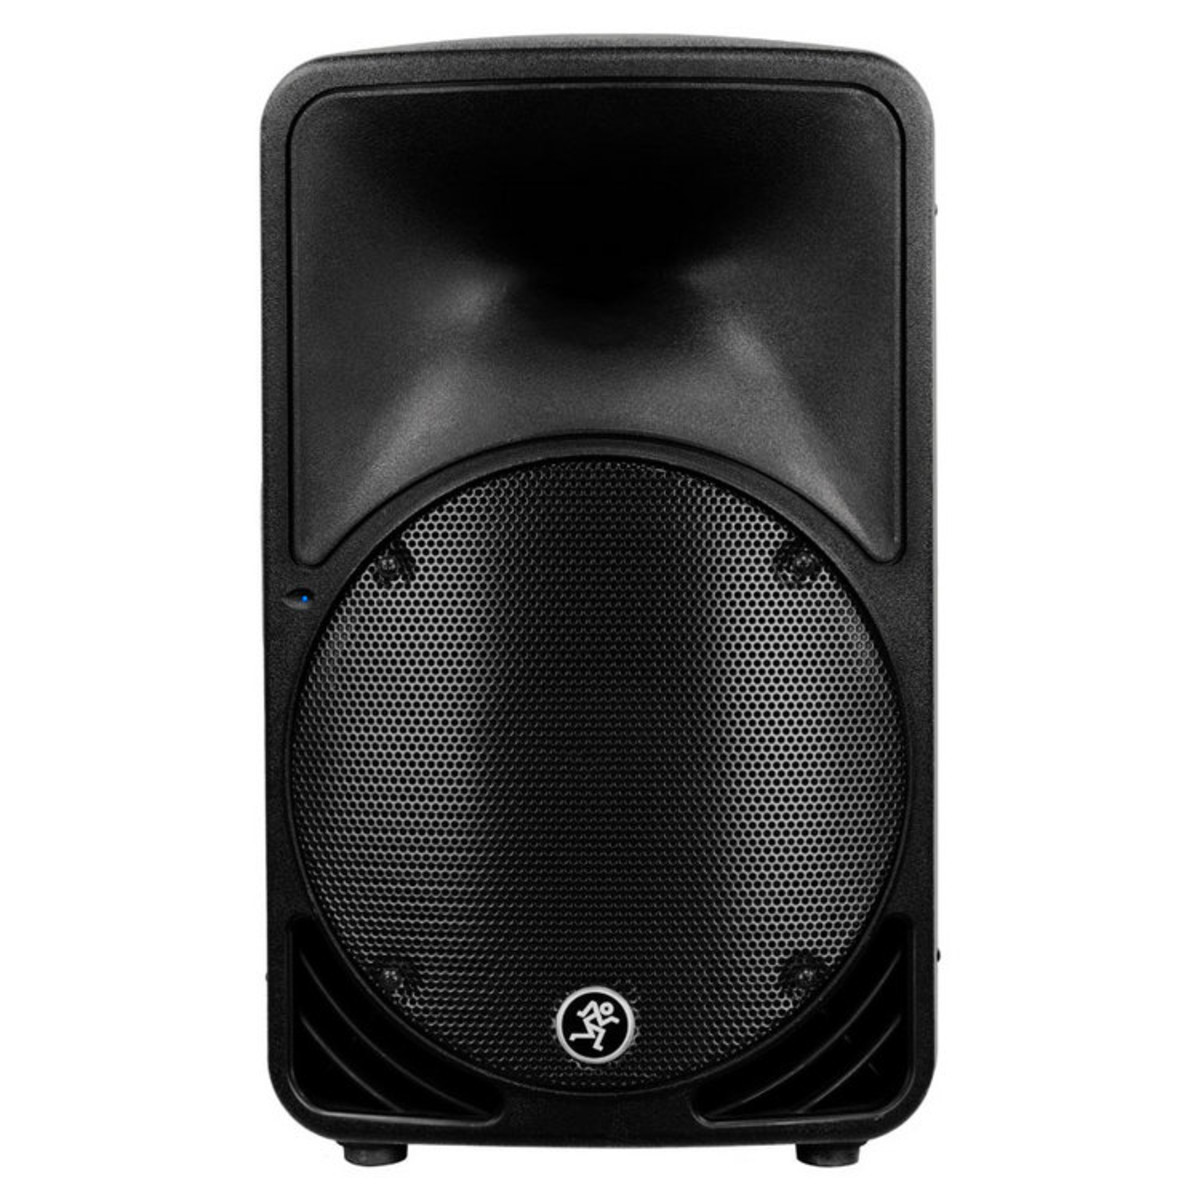 mackie c300z 12 passive speaker single nearly new at. Black Bedroom Furniture Sets. Home Design Ideas